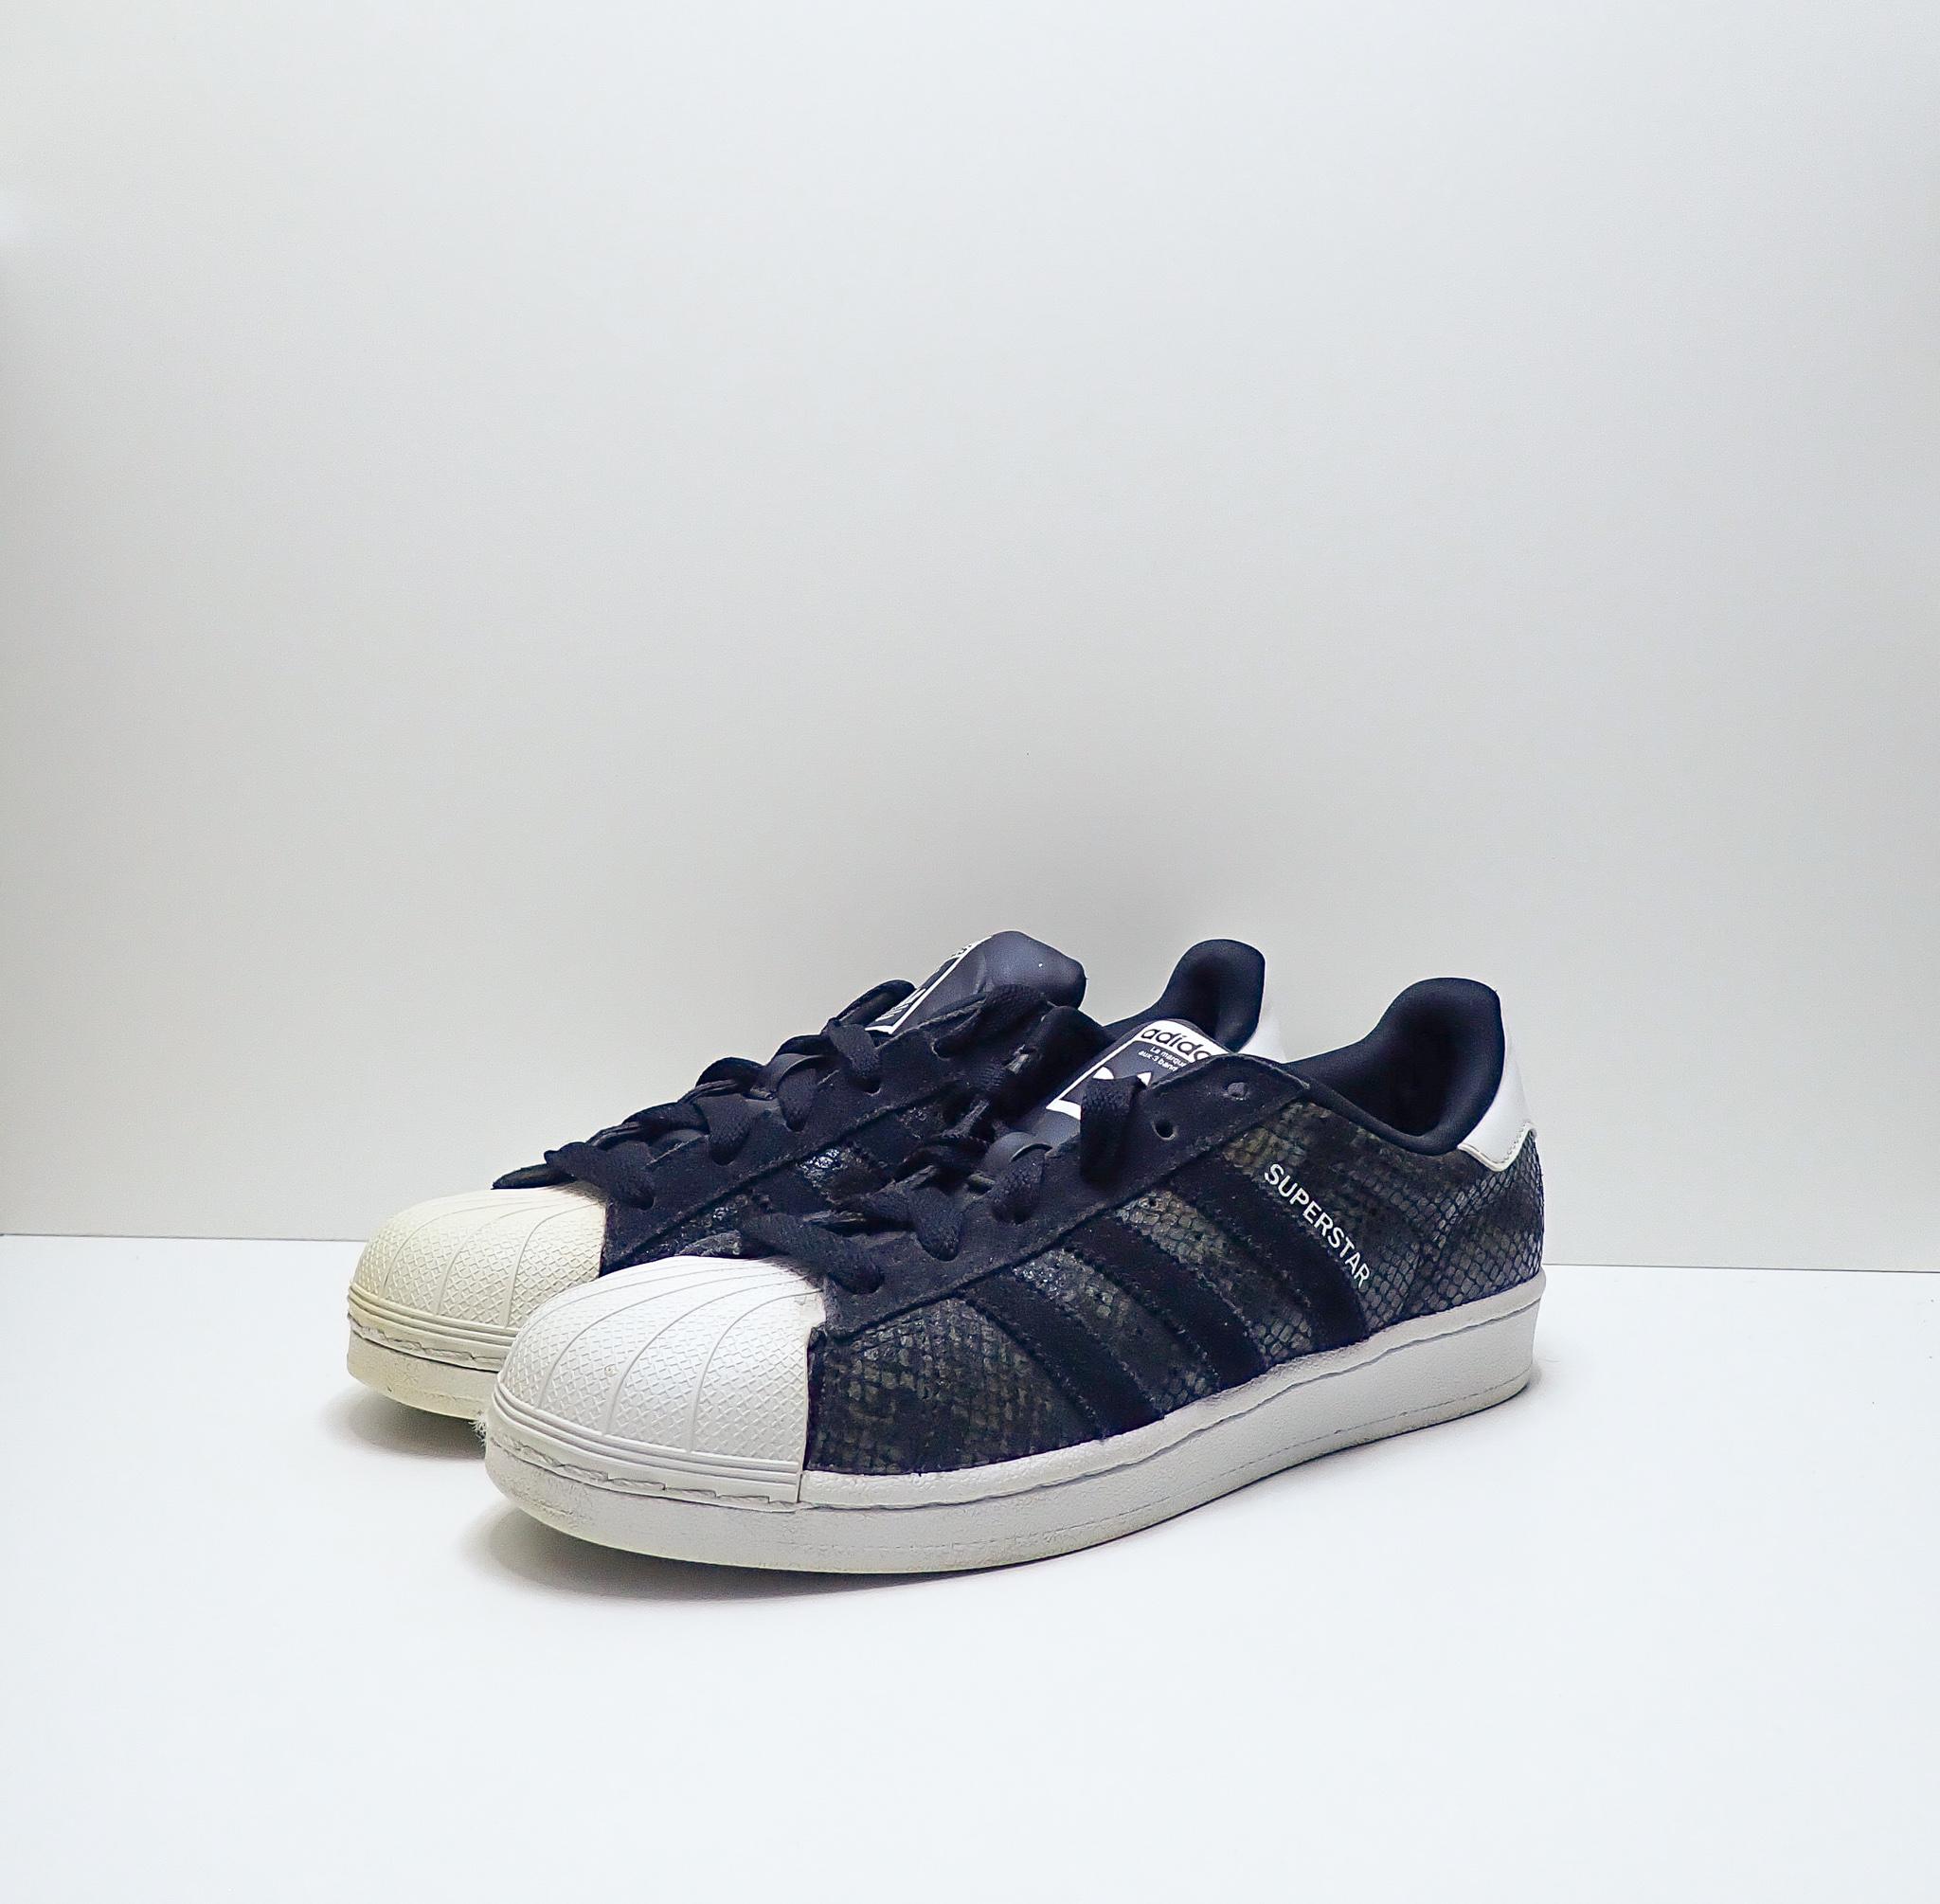 adidas Superstar (W) Black Snake